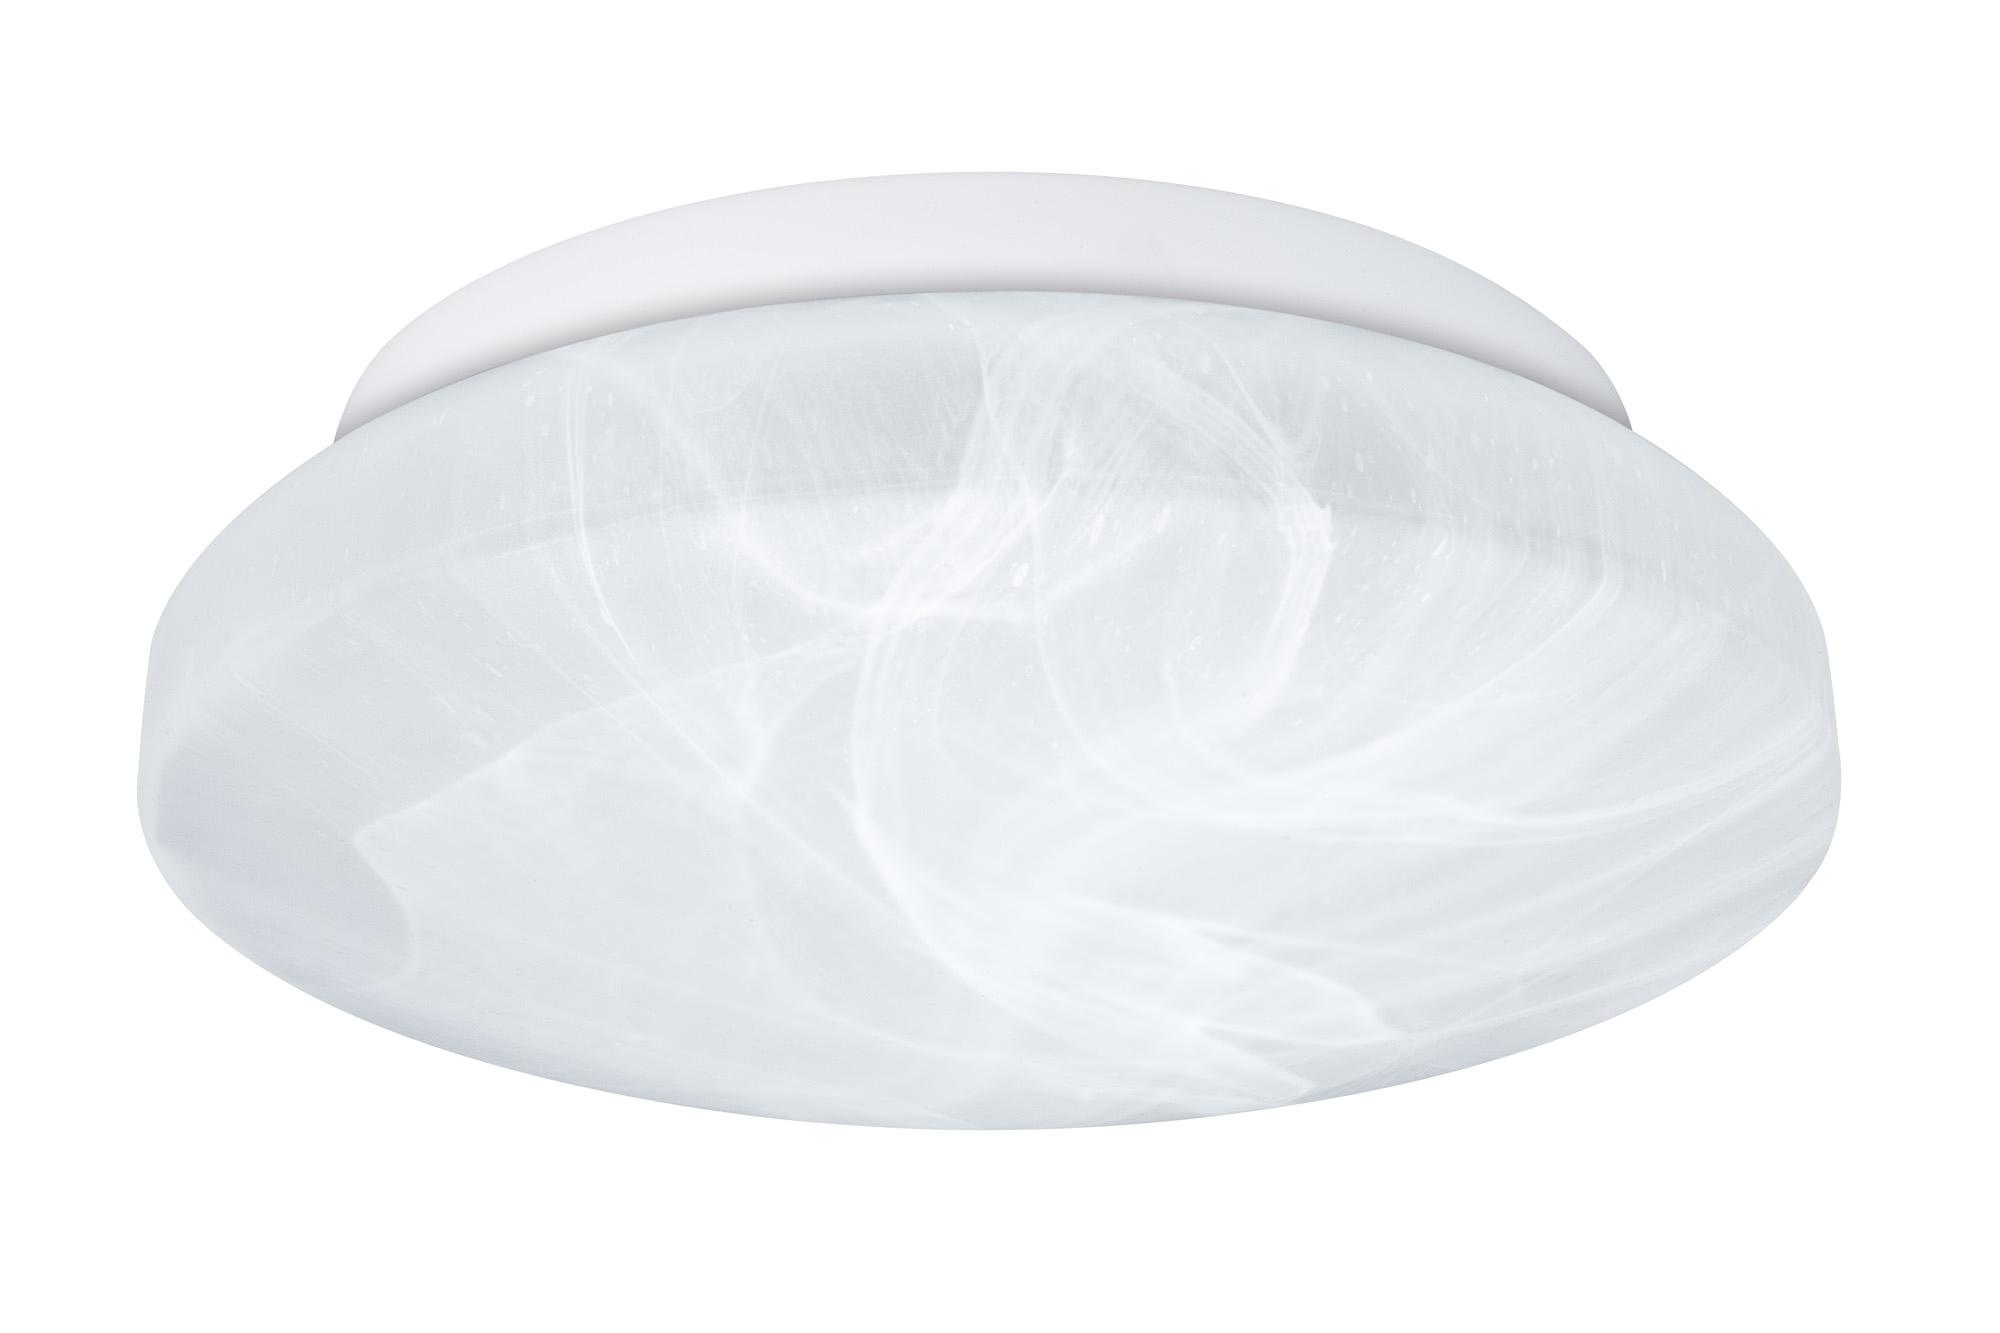 Paulmann. 70340 Светильник настенно-потолочный 1х60W Berengo 230V E27 Белый/Опал